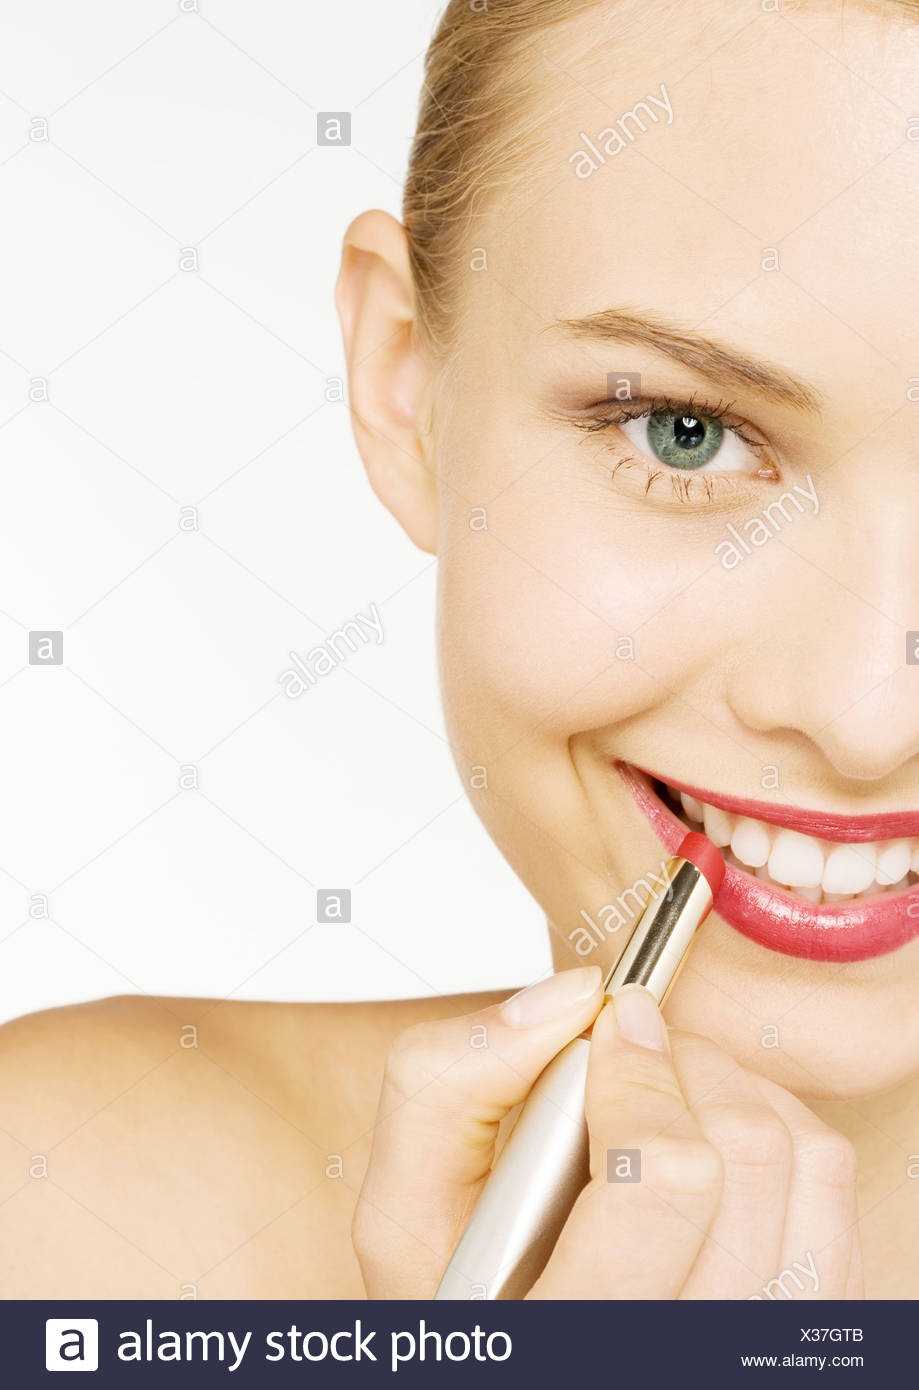 Woman applying lipstick, partial view Stock Photo